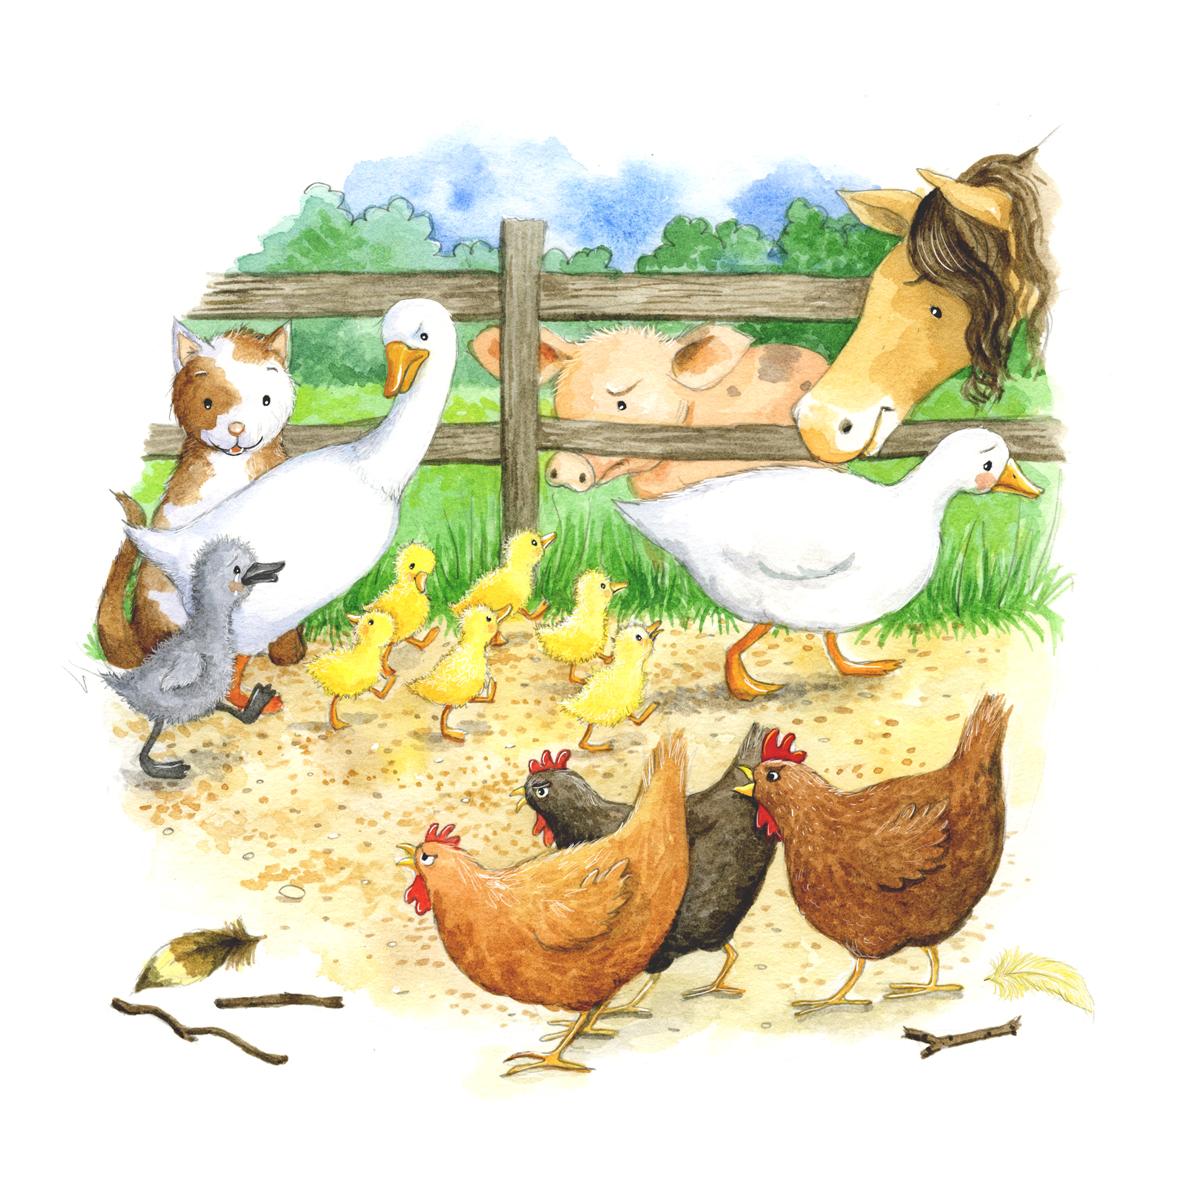 The ugly duckling_farm animals making fun_gail yerrill